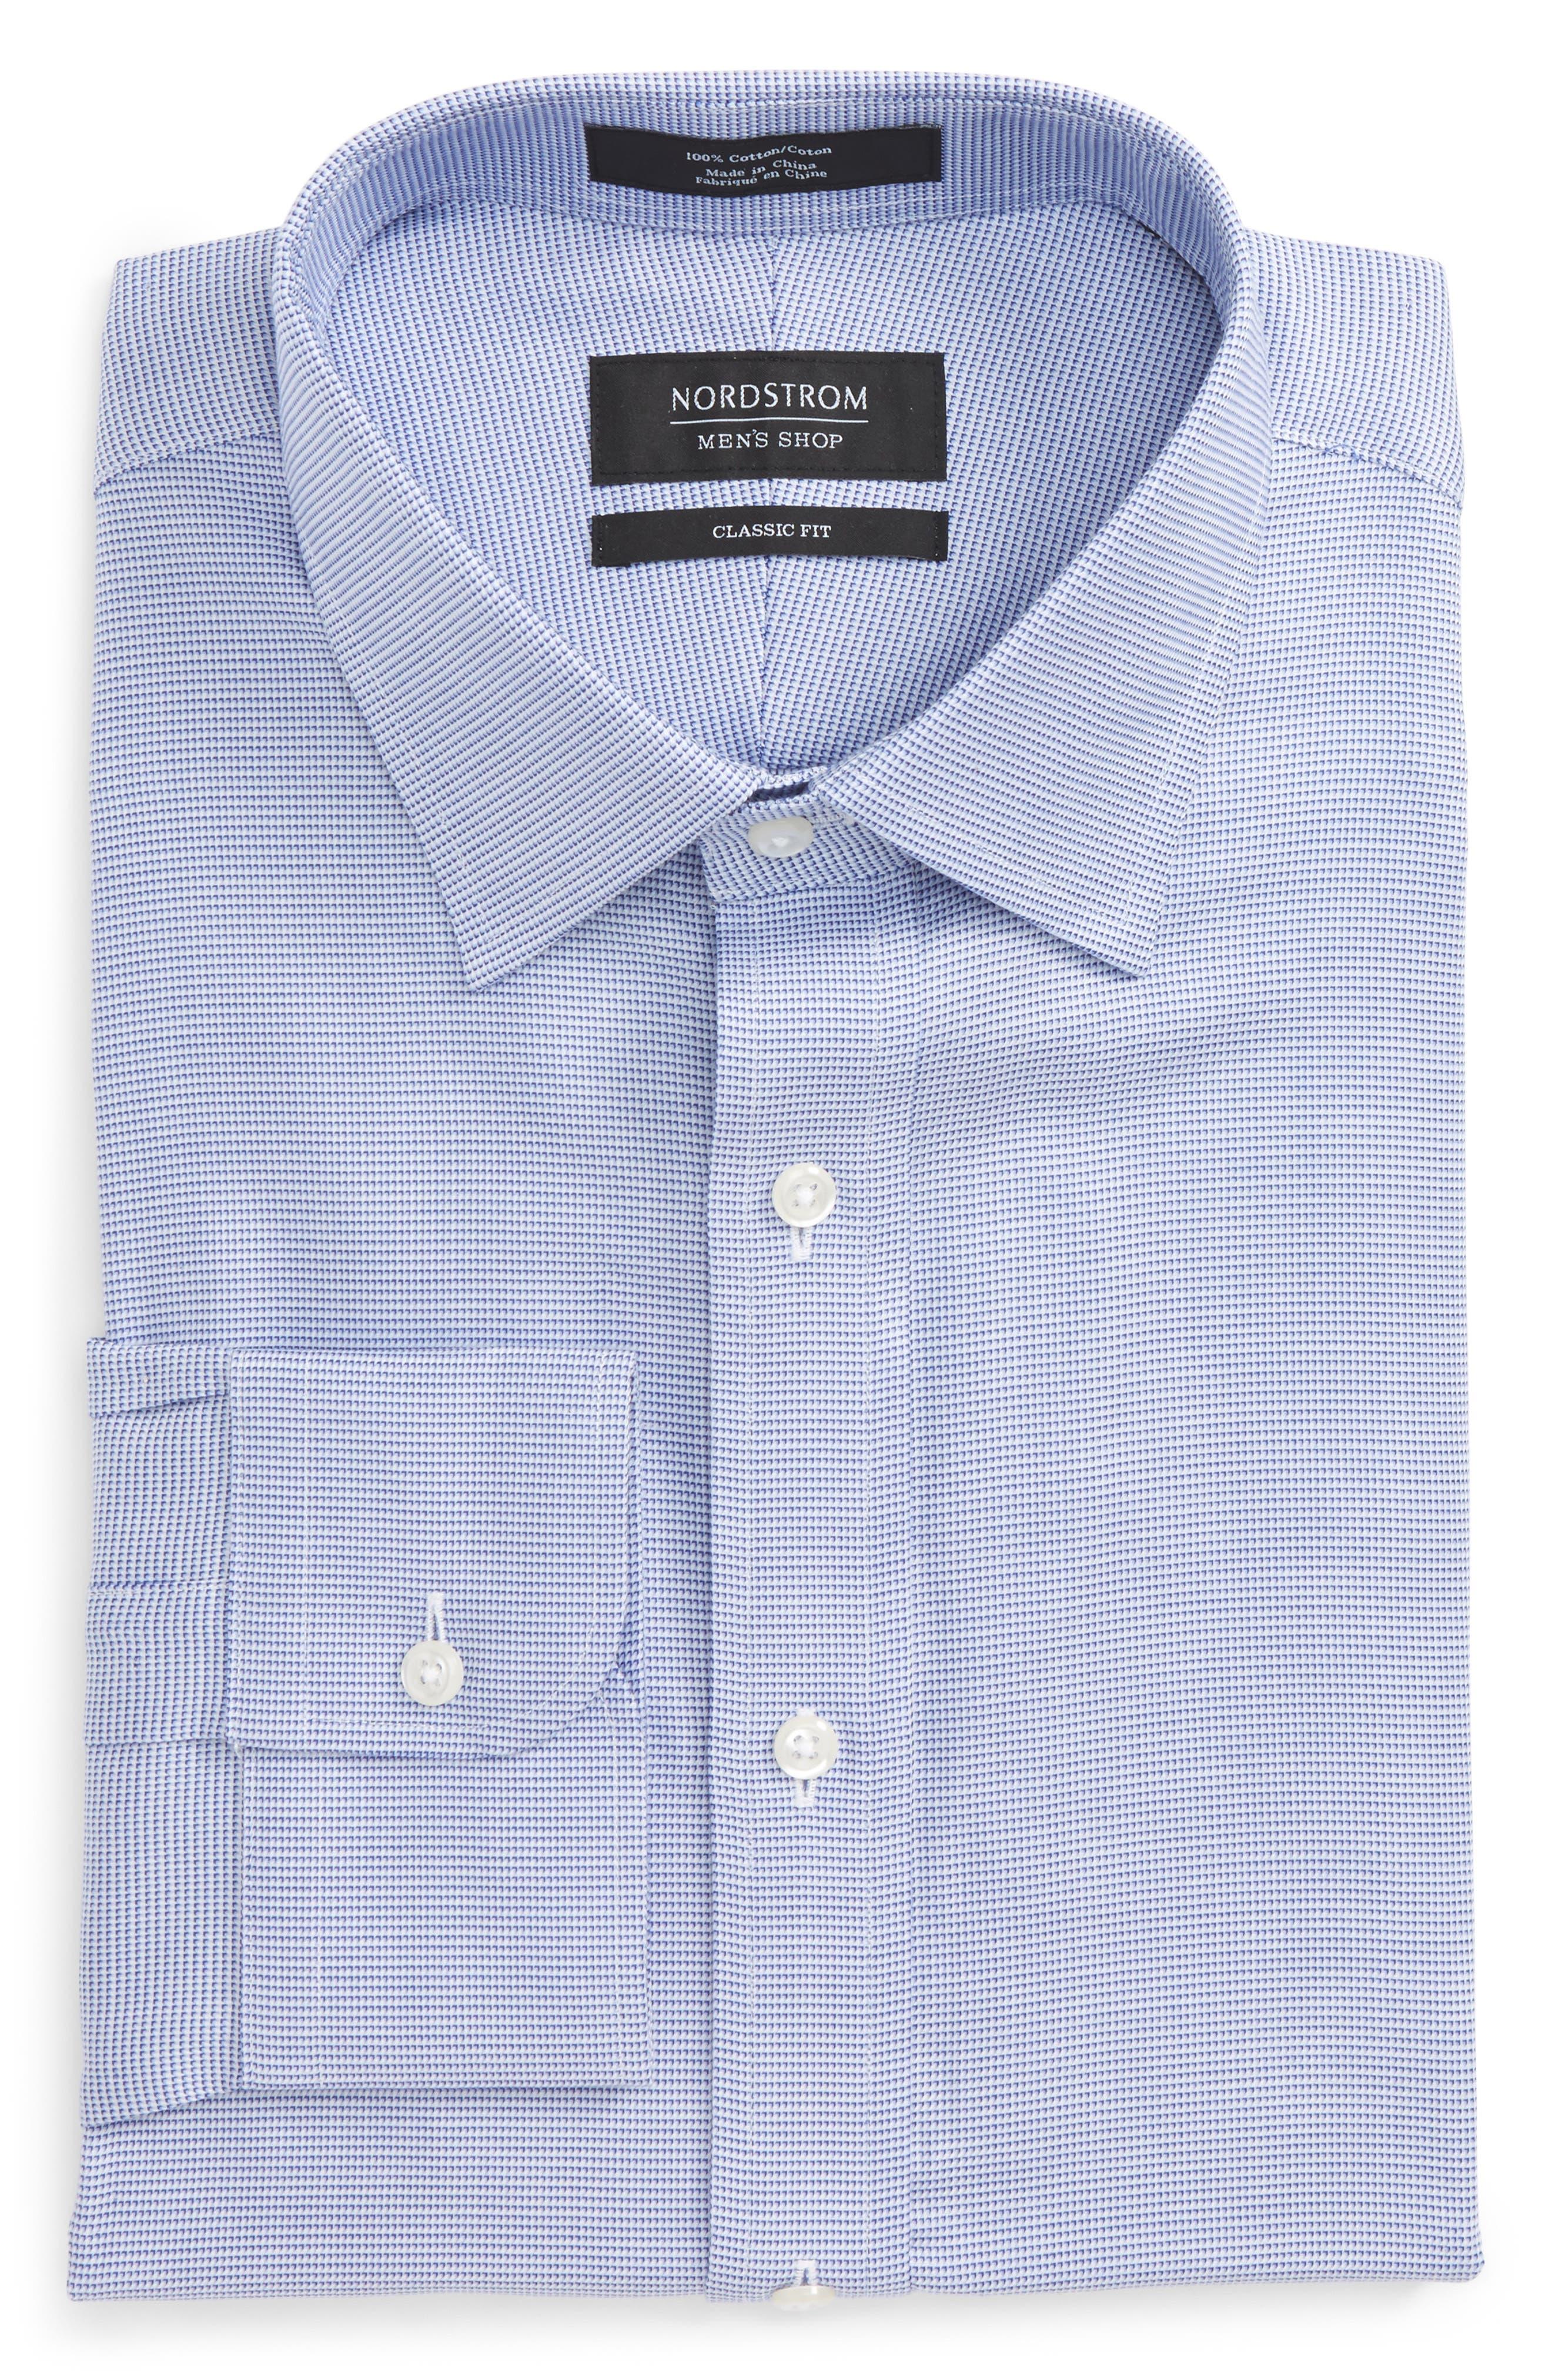 Classic Fit Solid Dress Shirt,                             Main thumbnail 1, color,                             420